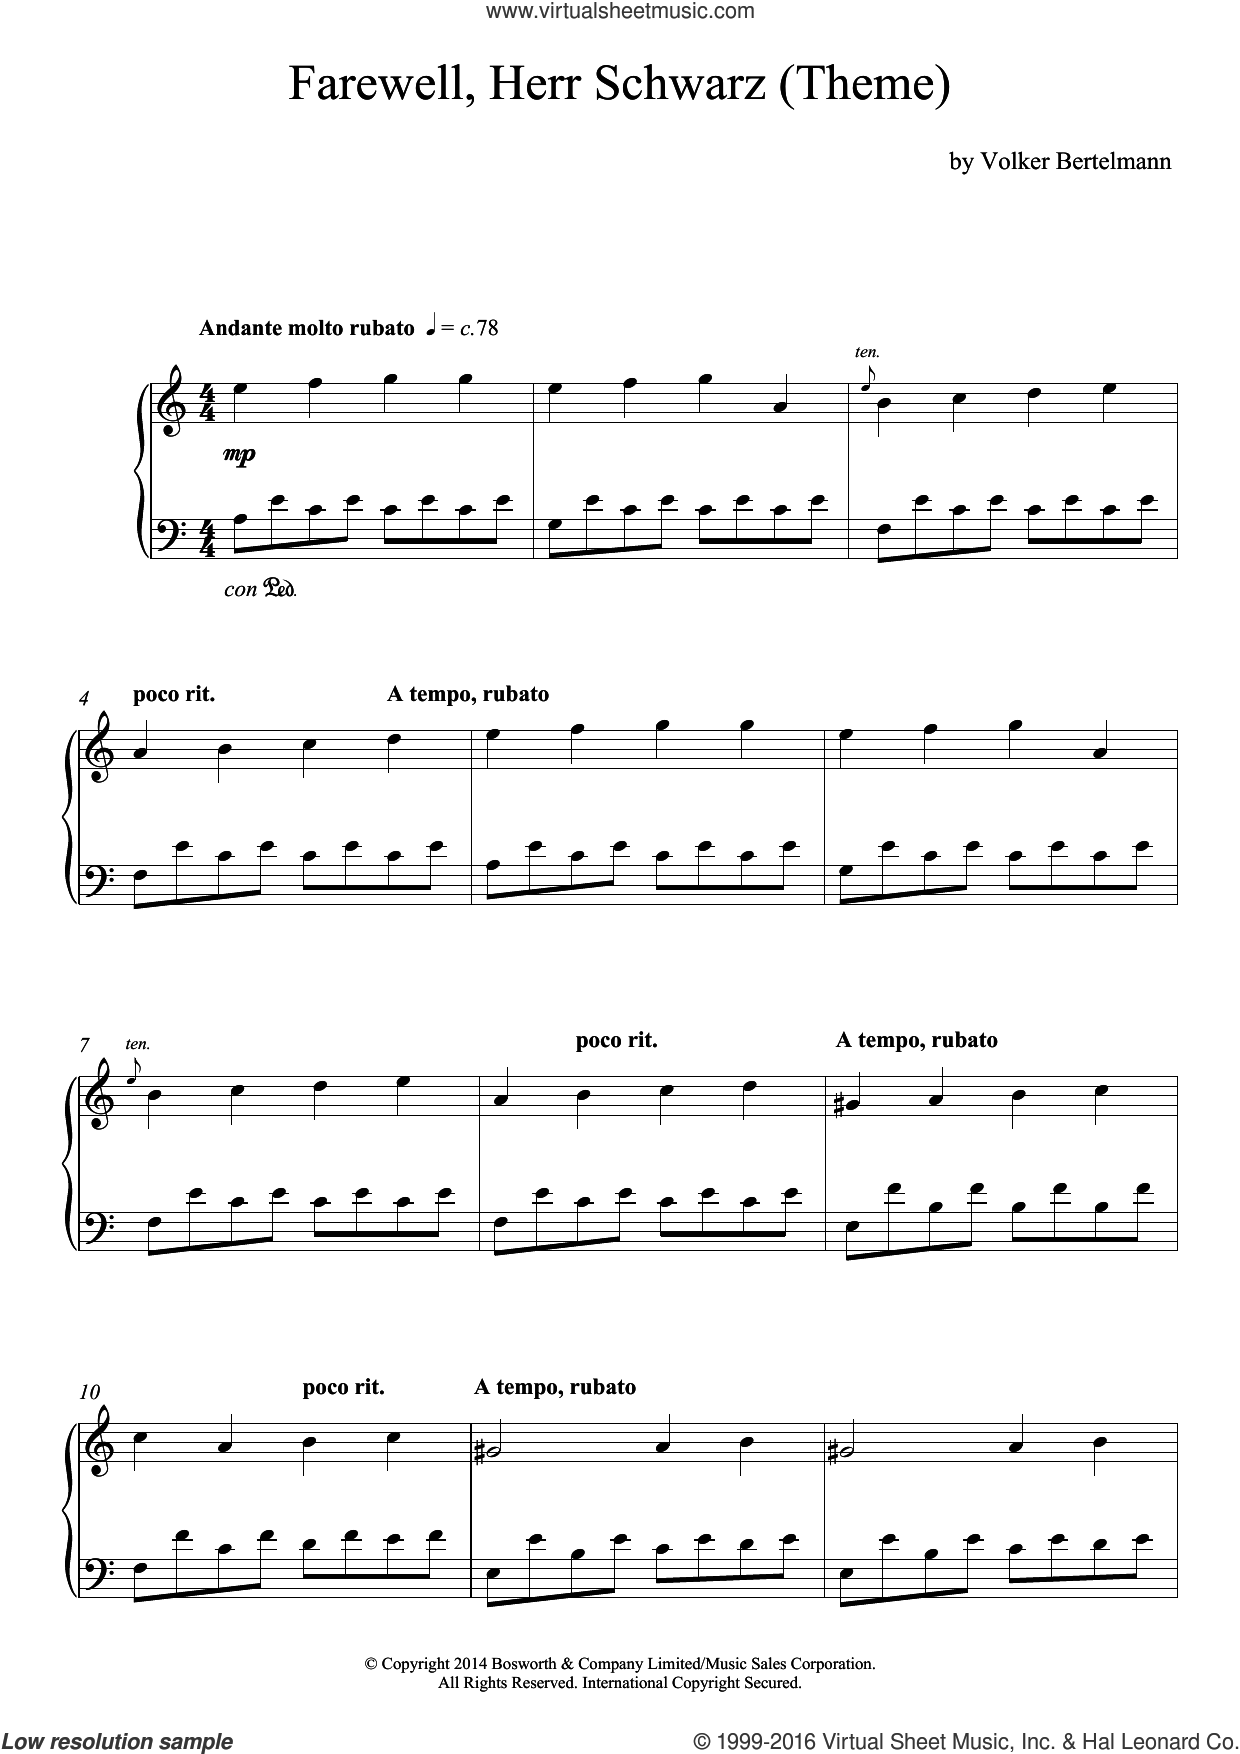 Farewell, Herr Schwarz (Theme) sheet music for piano solo by Hauschka and Volker Bertelmann, classical score, intermediate skill level